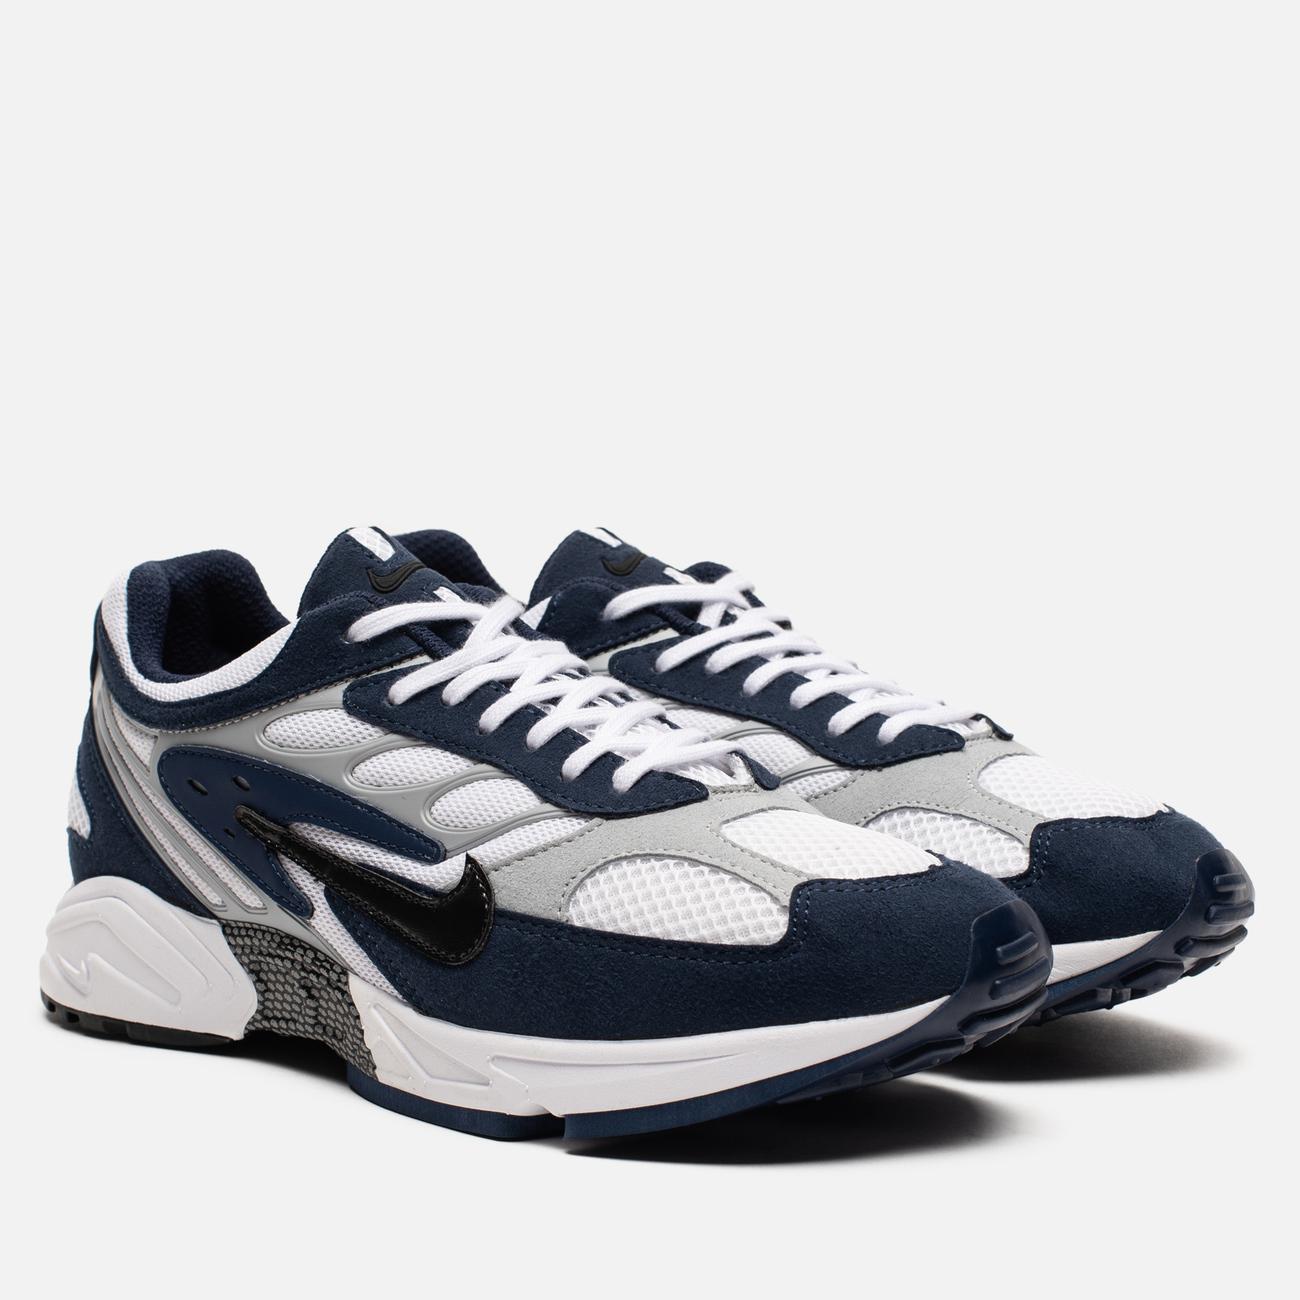 Мужские кроссовки Nike Air Ghost Racer Midnight Navy/Black/Wolf Grey/White